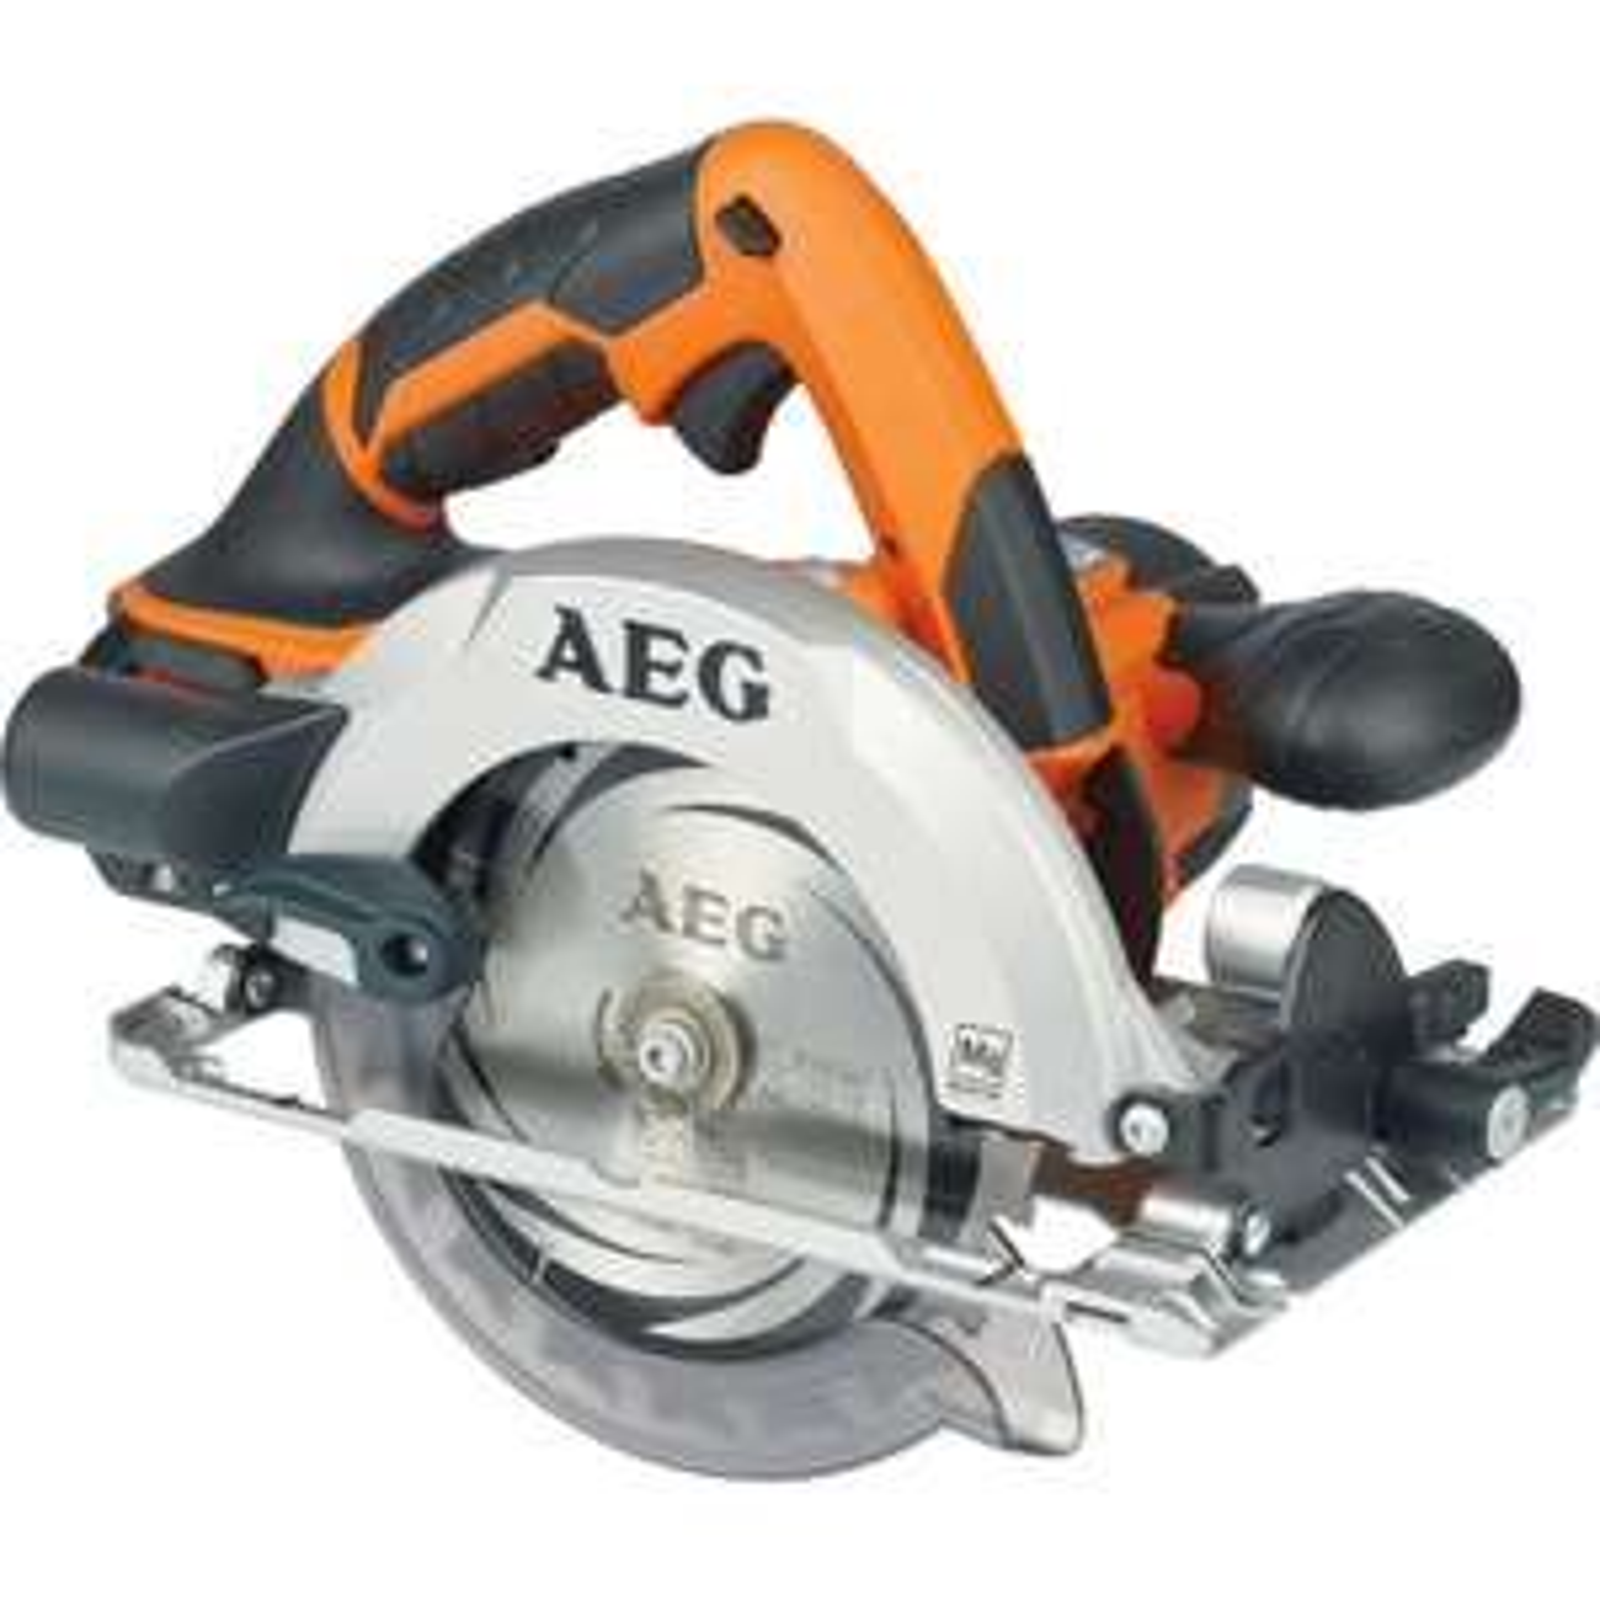 AEG 18v Circular Saw 165mm body only £32.50 @ Homebase